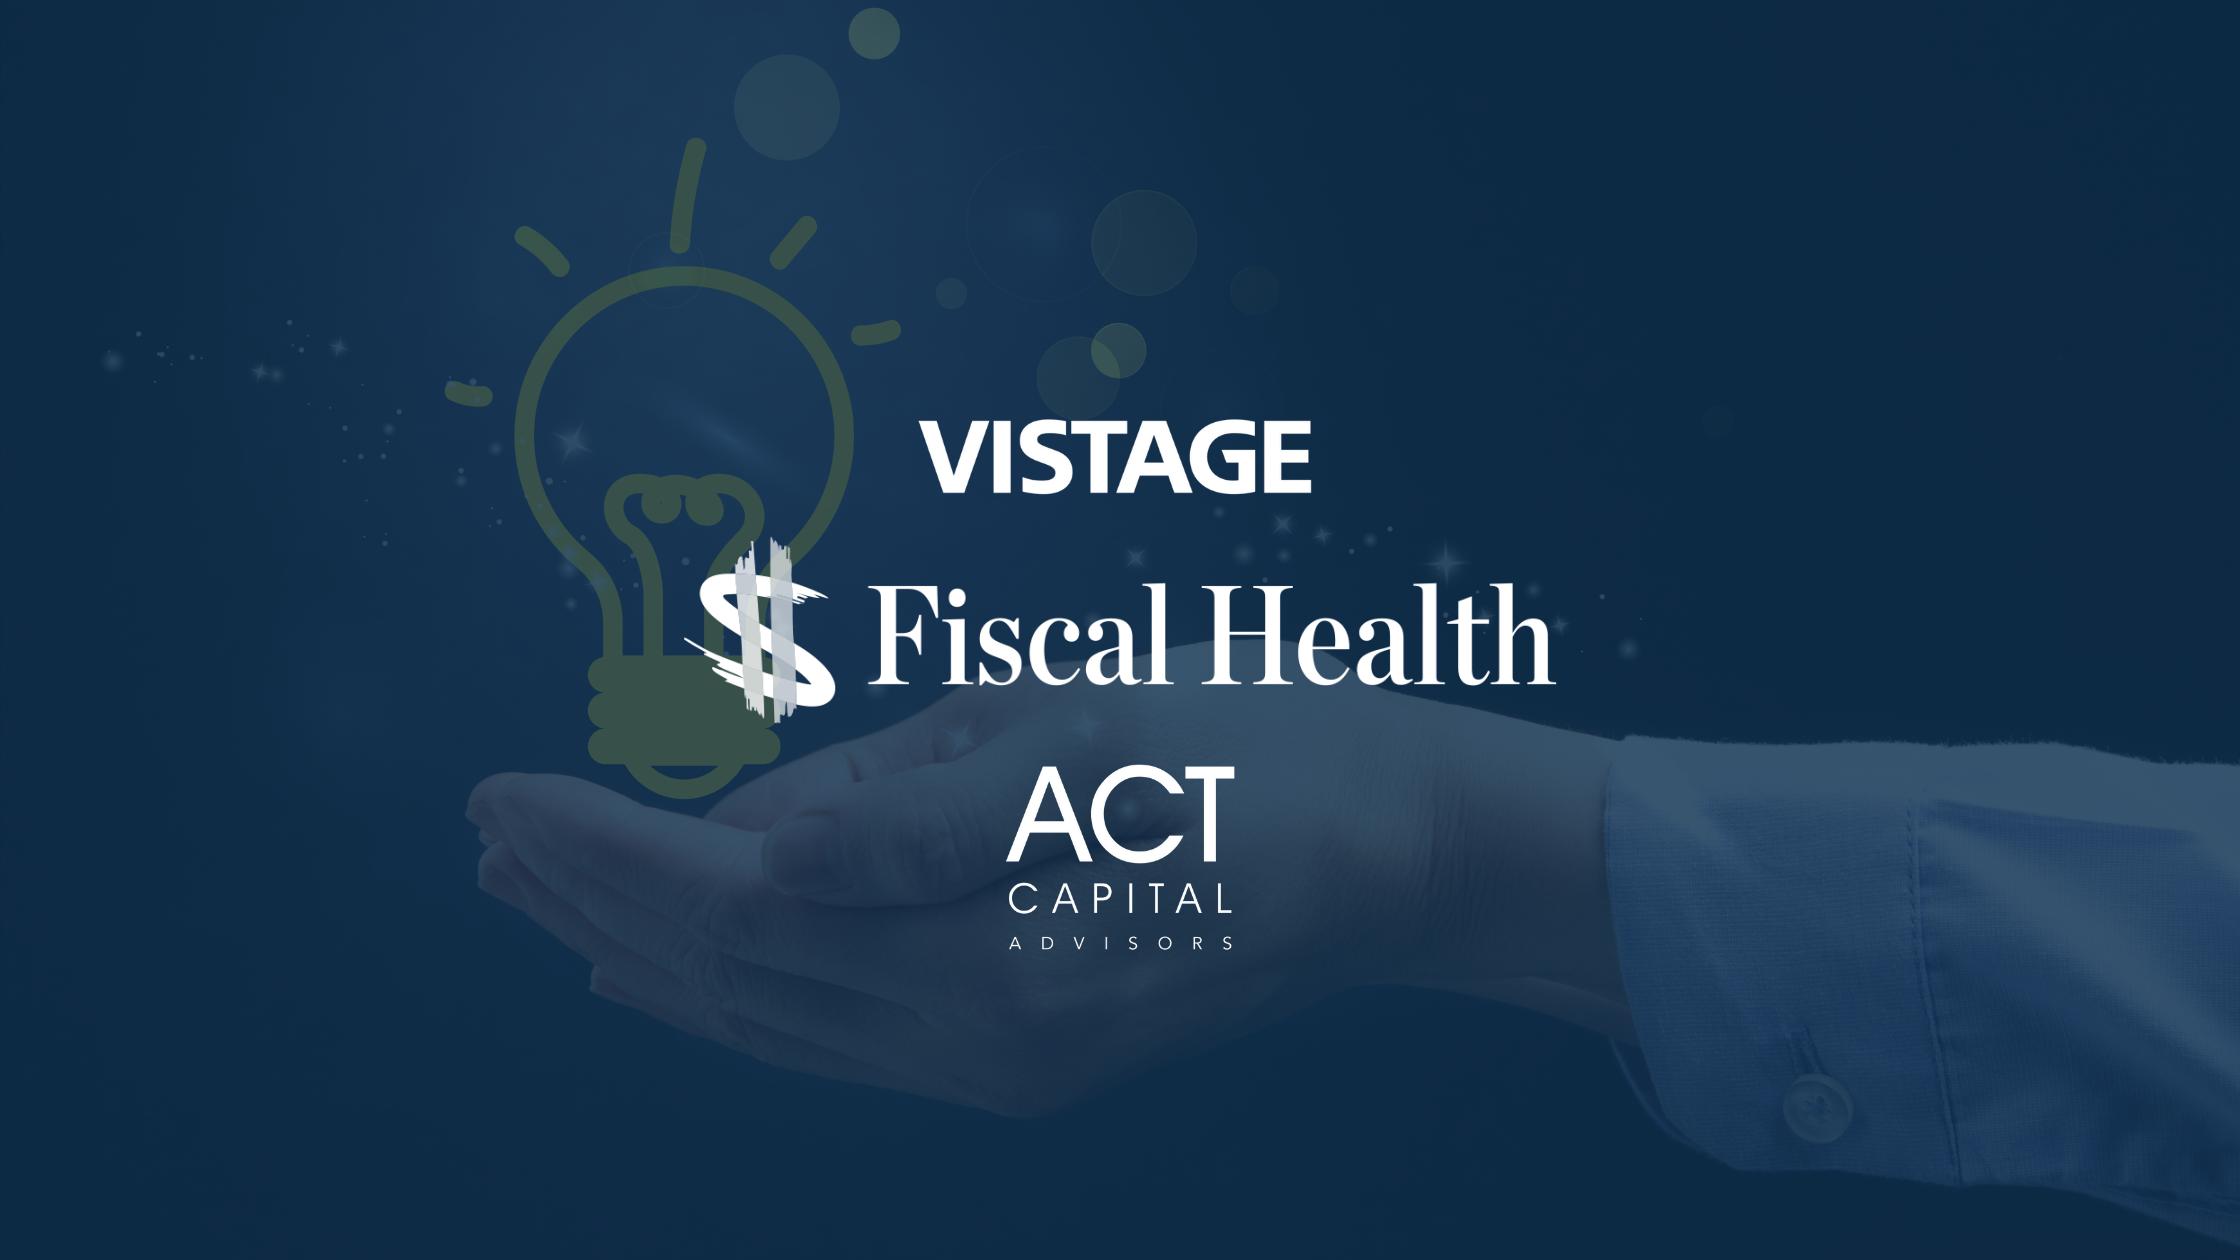 Vistage ACT Capital presentation